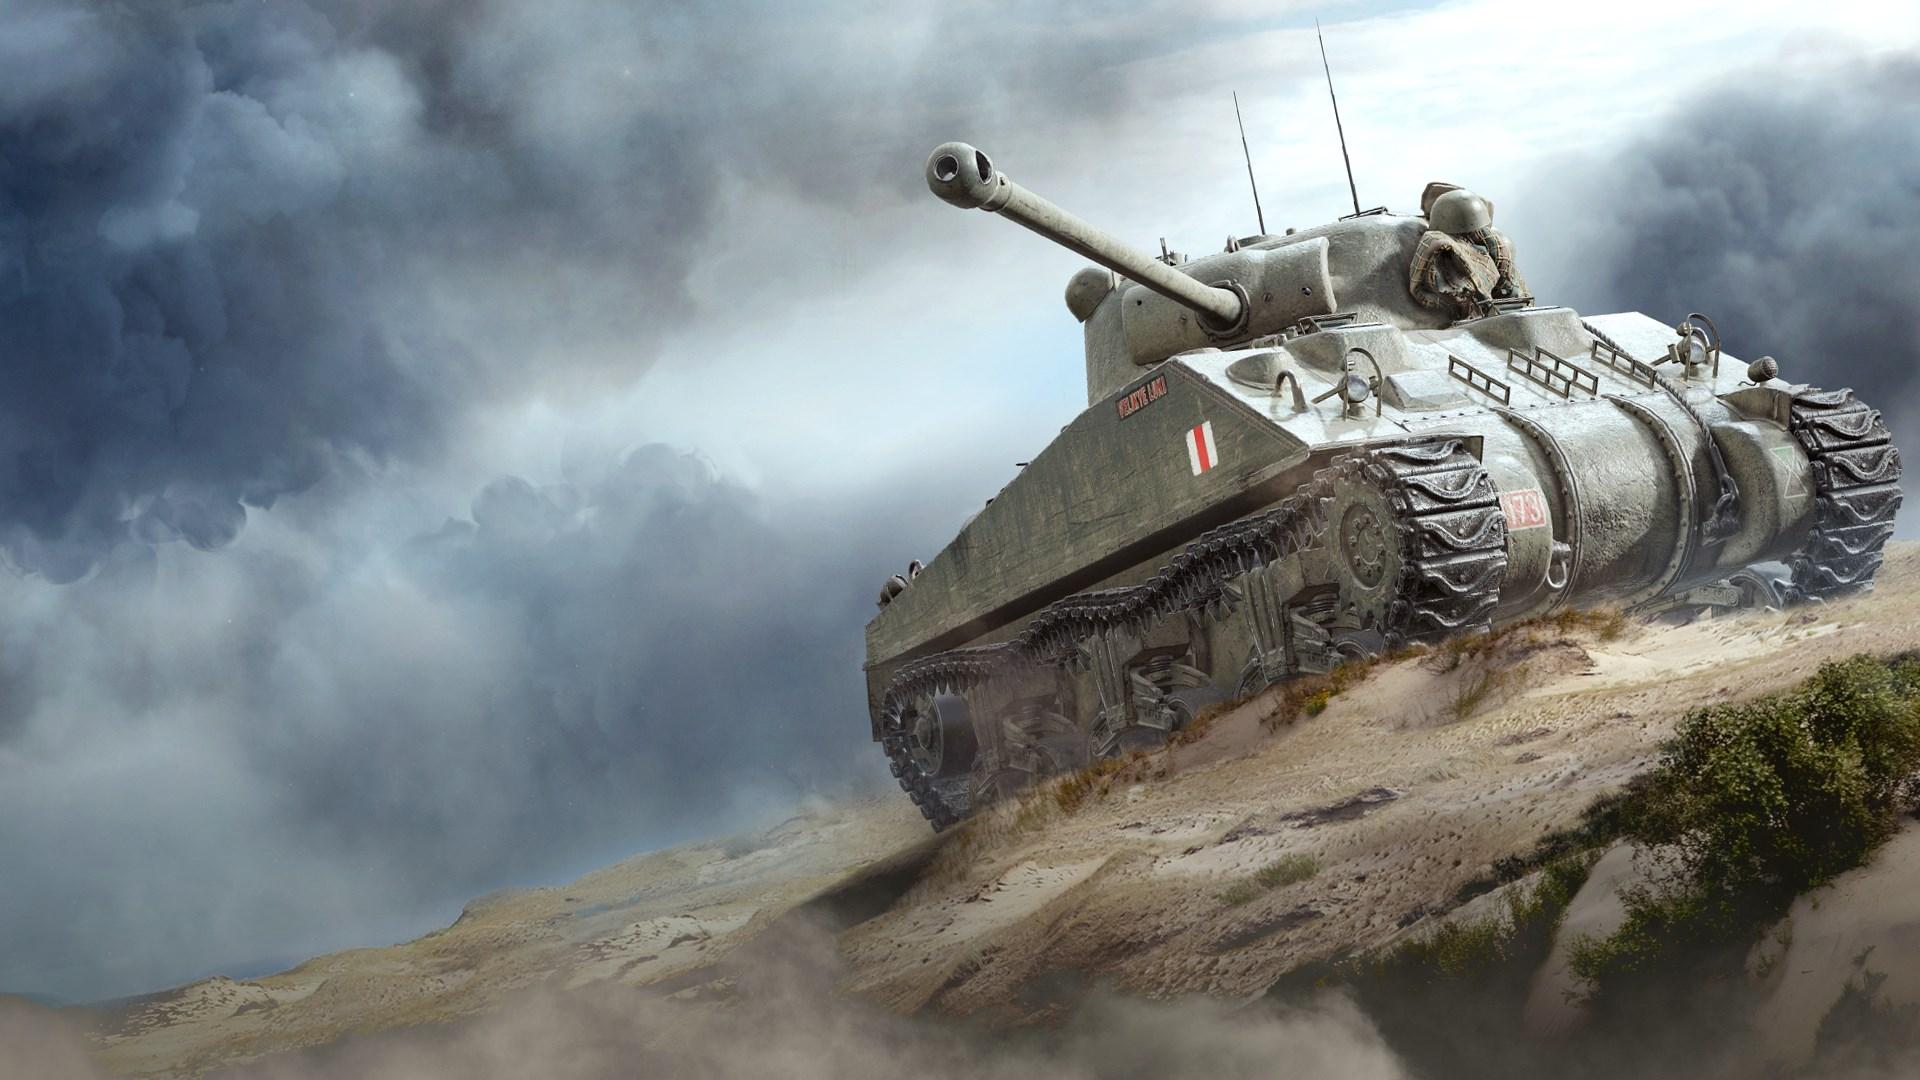 World of Tanks - Sherman VC Firefly Ultimate